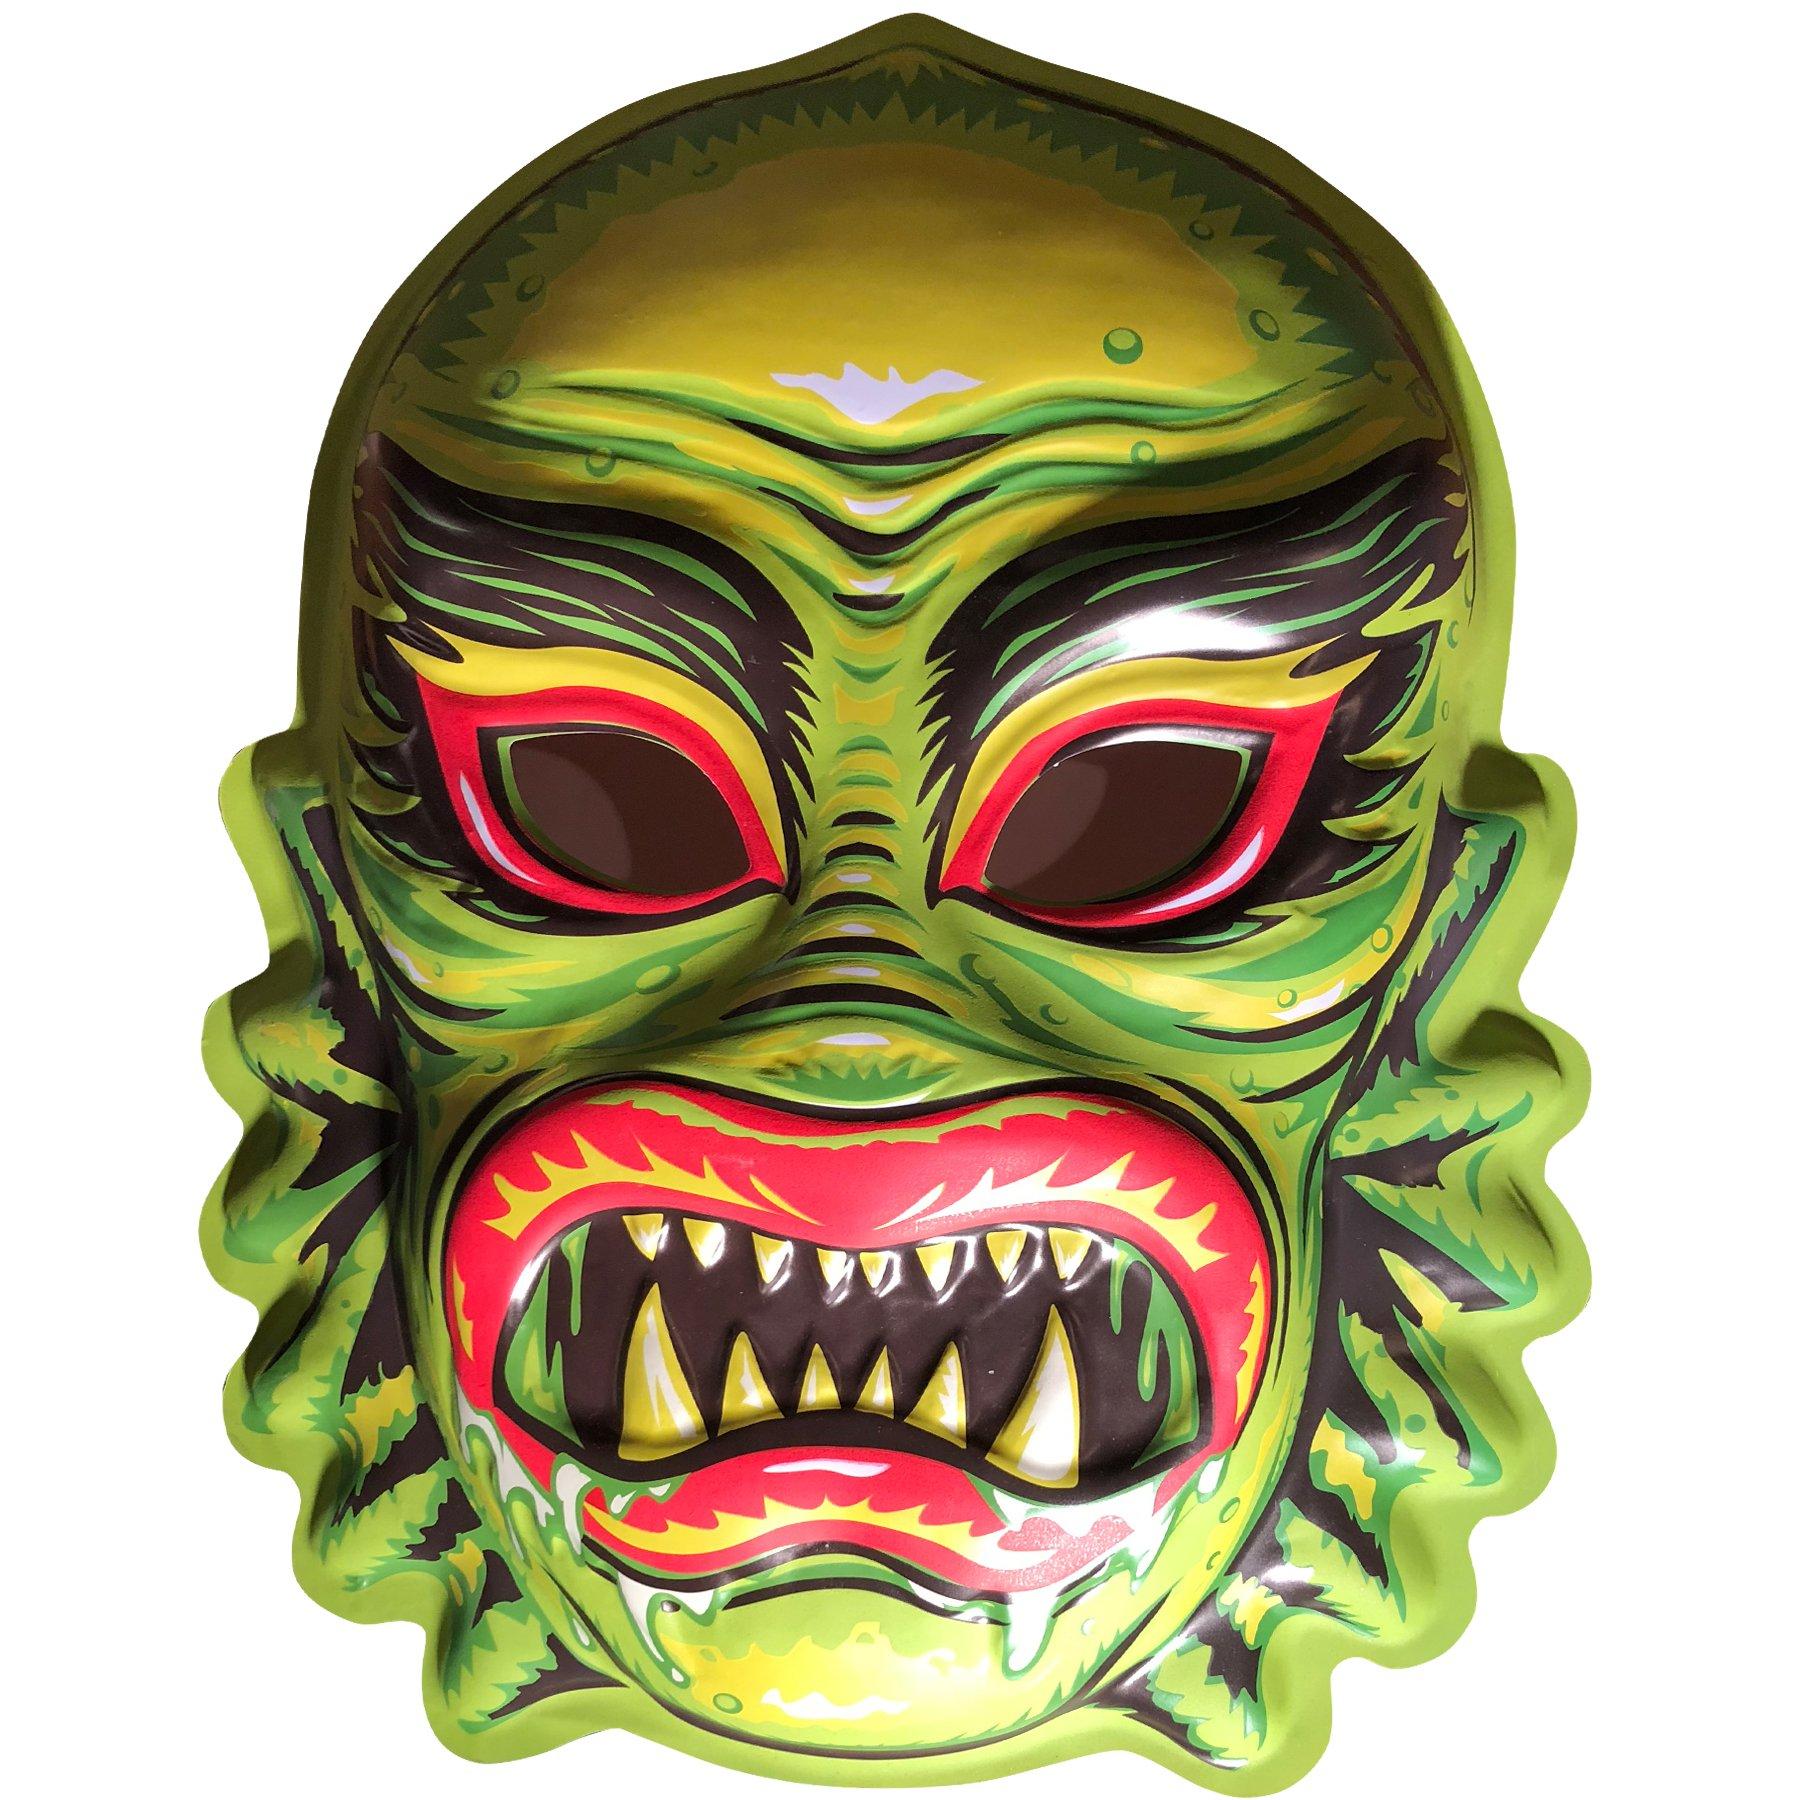 Retro-a-go-go! Gill Freak Vac-Tastic Plastic Mask Wall Decor by Retro-a-go-go!